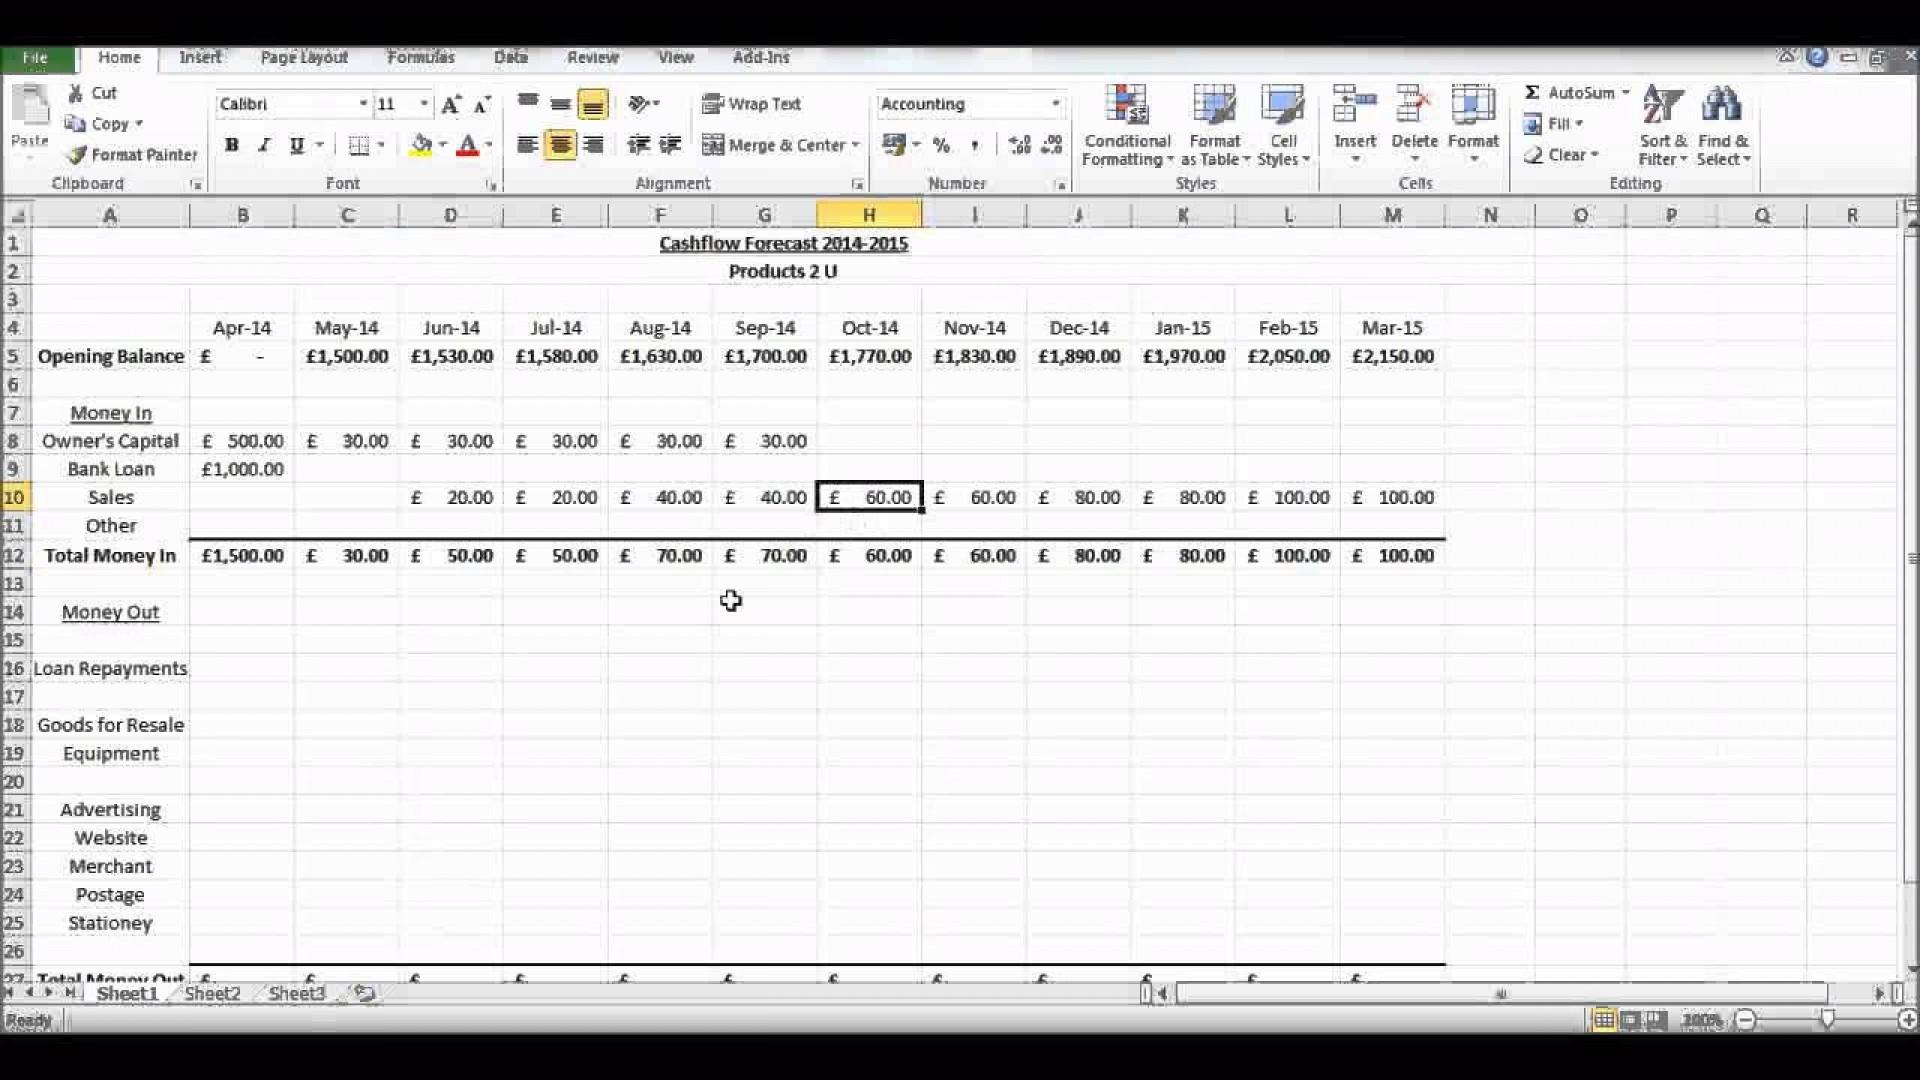 002 Impressive Cash Flow Sample Excel Photo  Spreadsheet Free Forecast Template1920